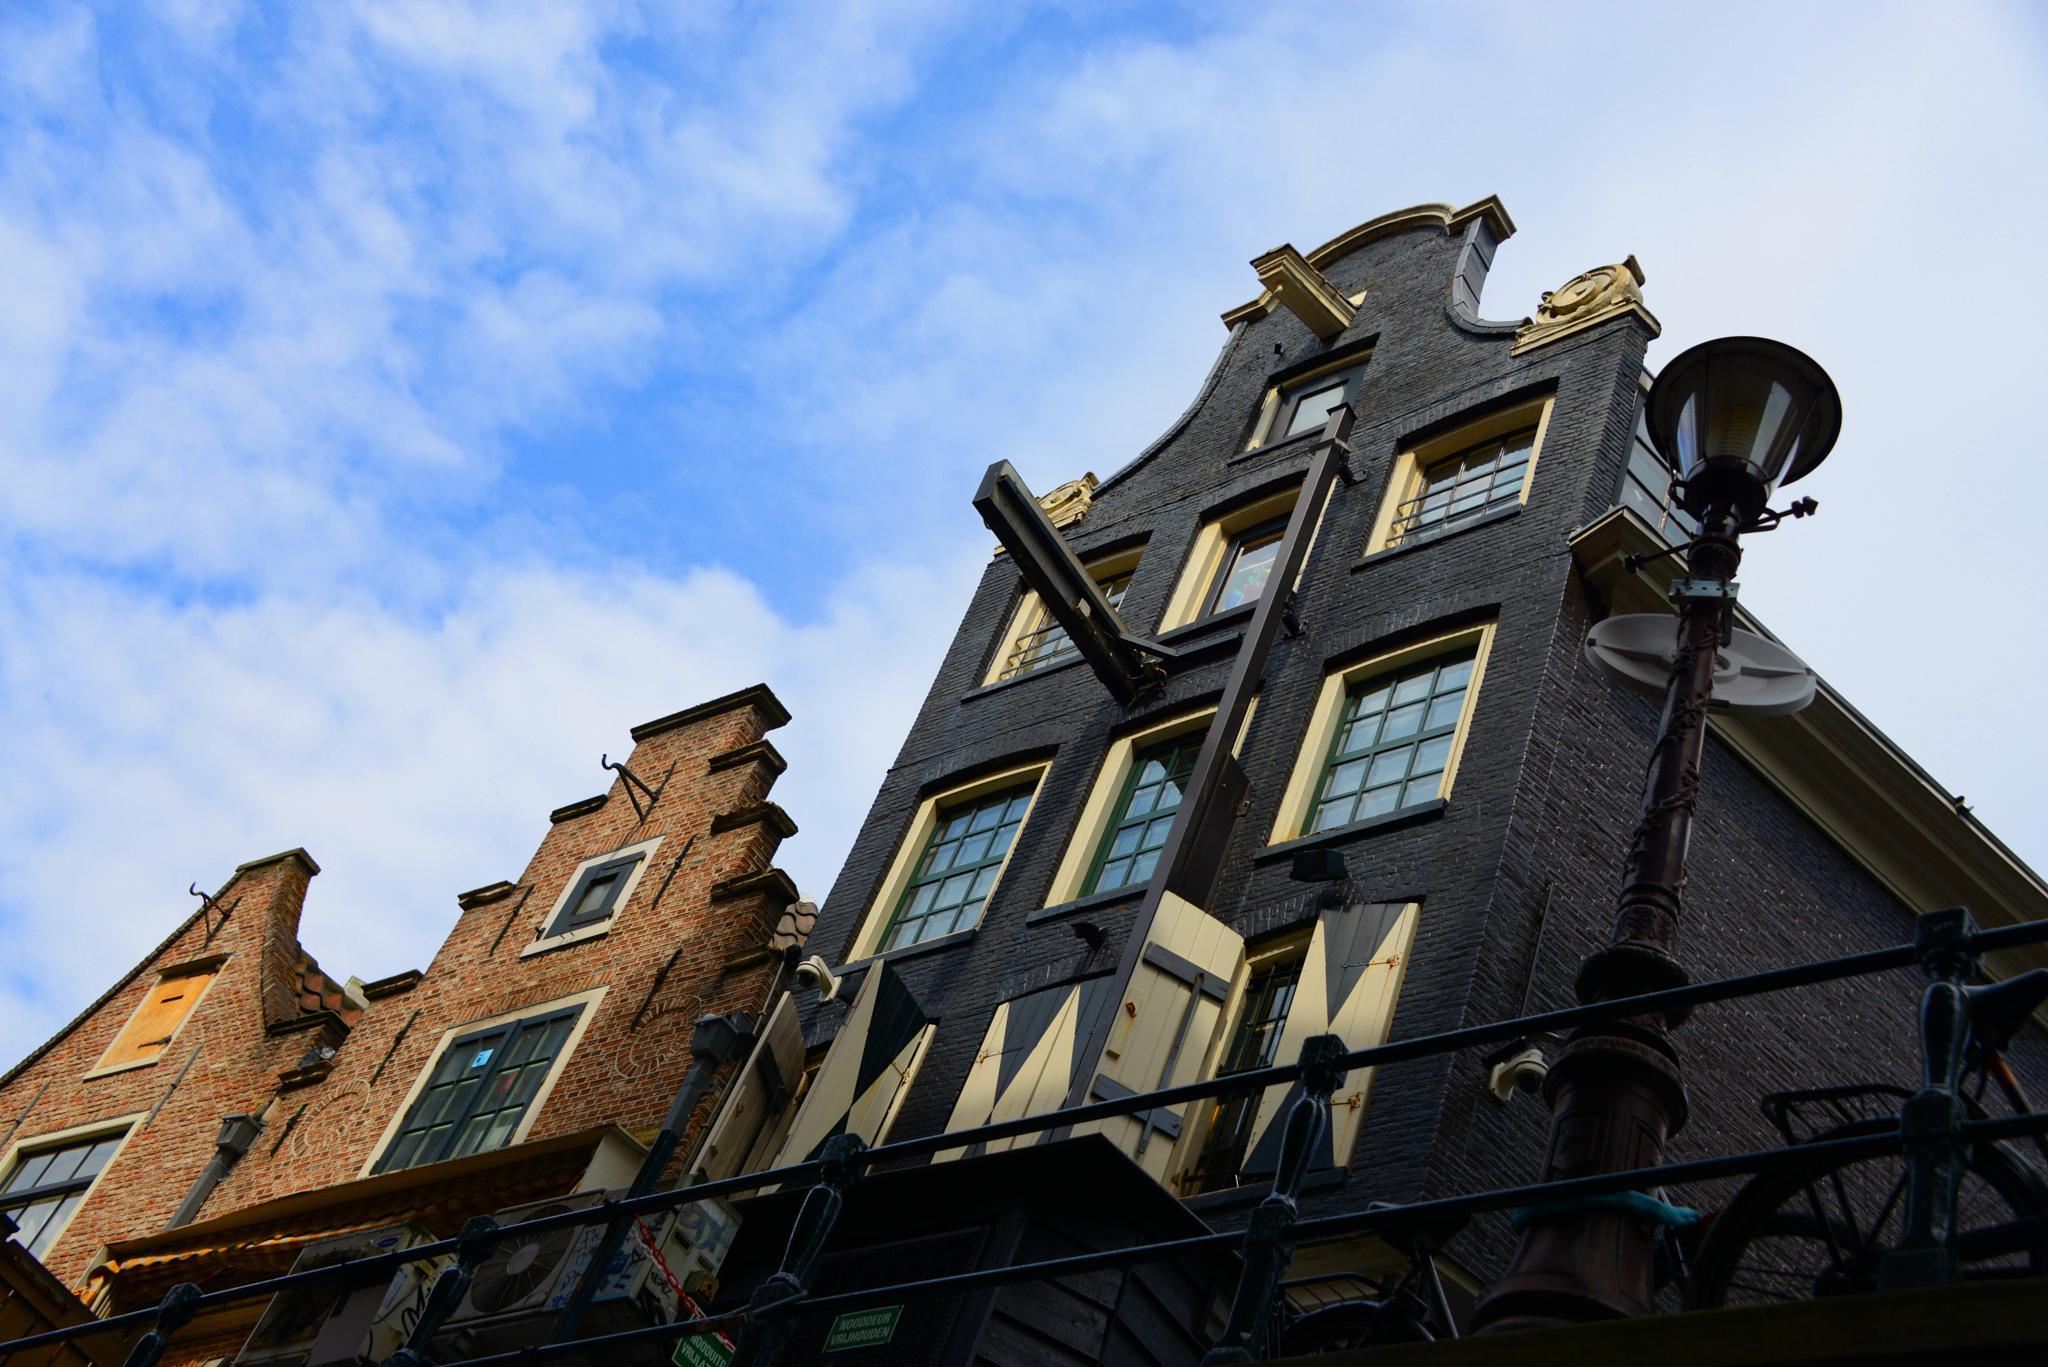 Amsterdam by HenrikCM